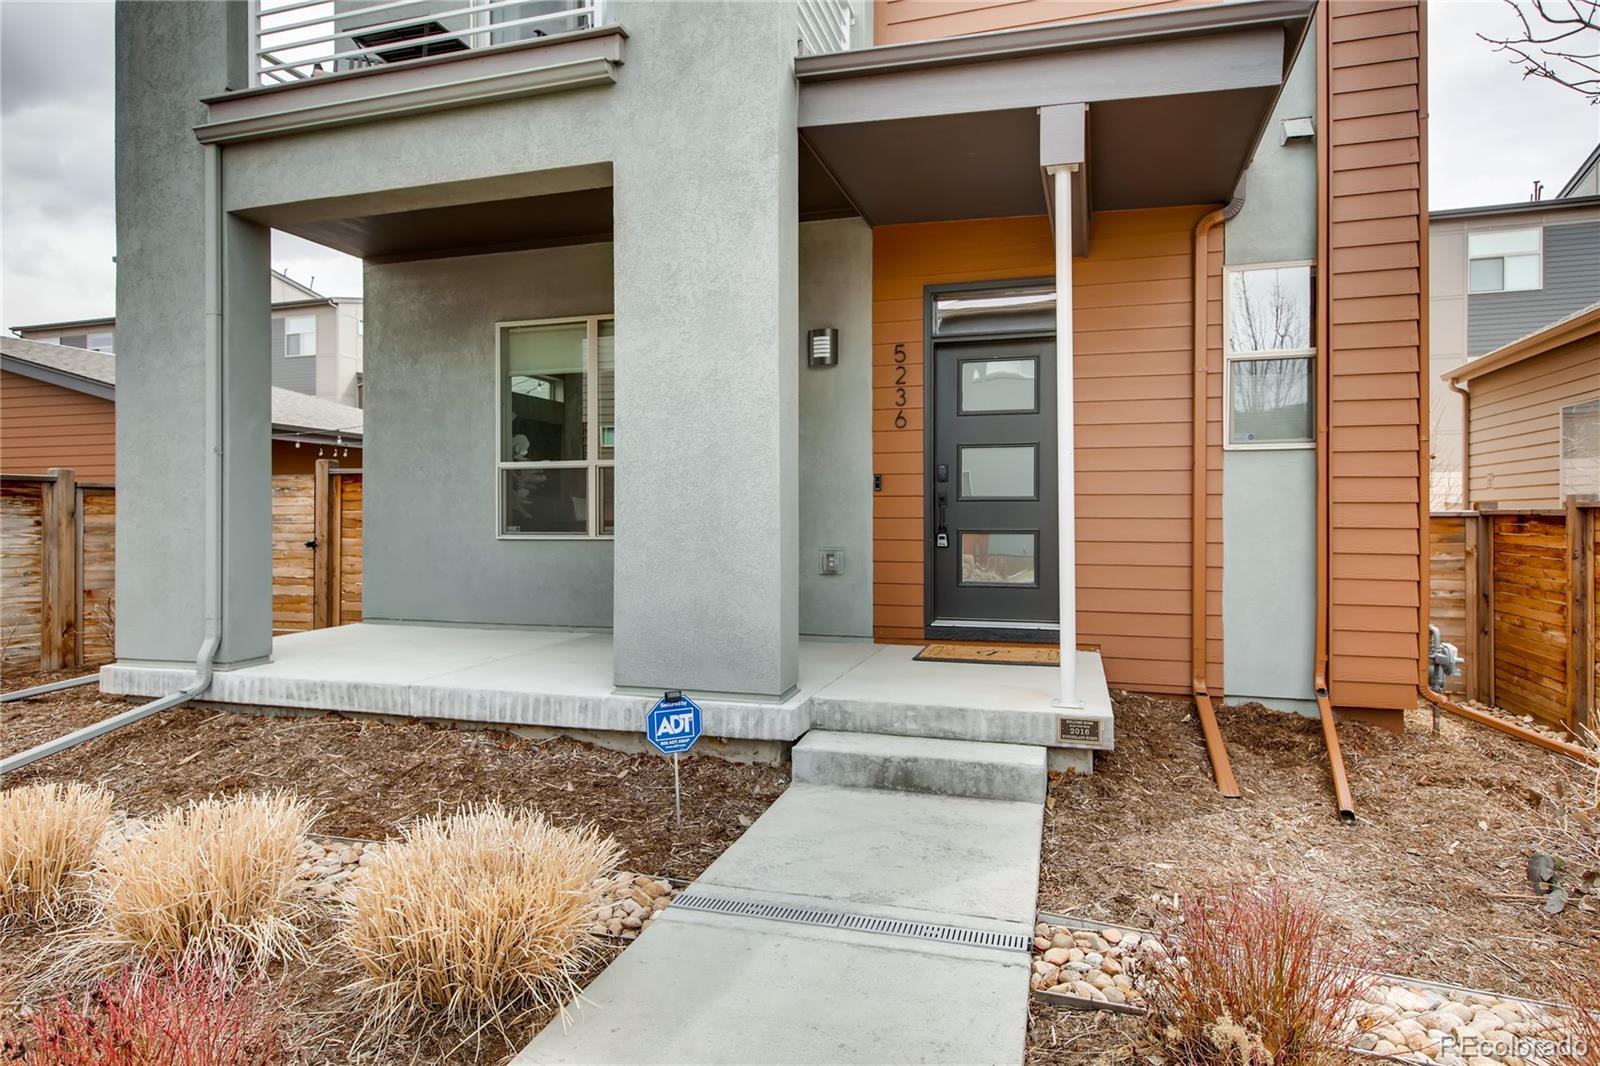 MLS# 6750540 - 3 - 5236 Akron Street, Denver, CO 80238